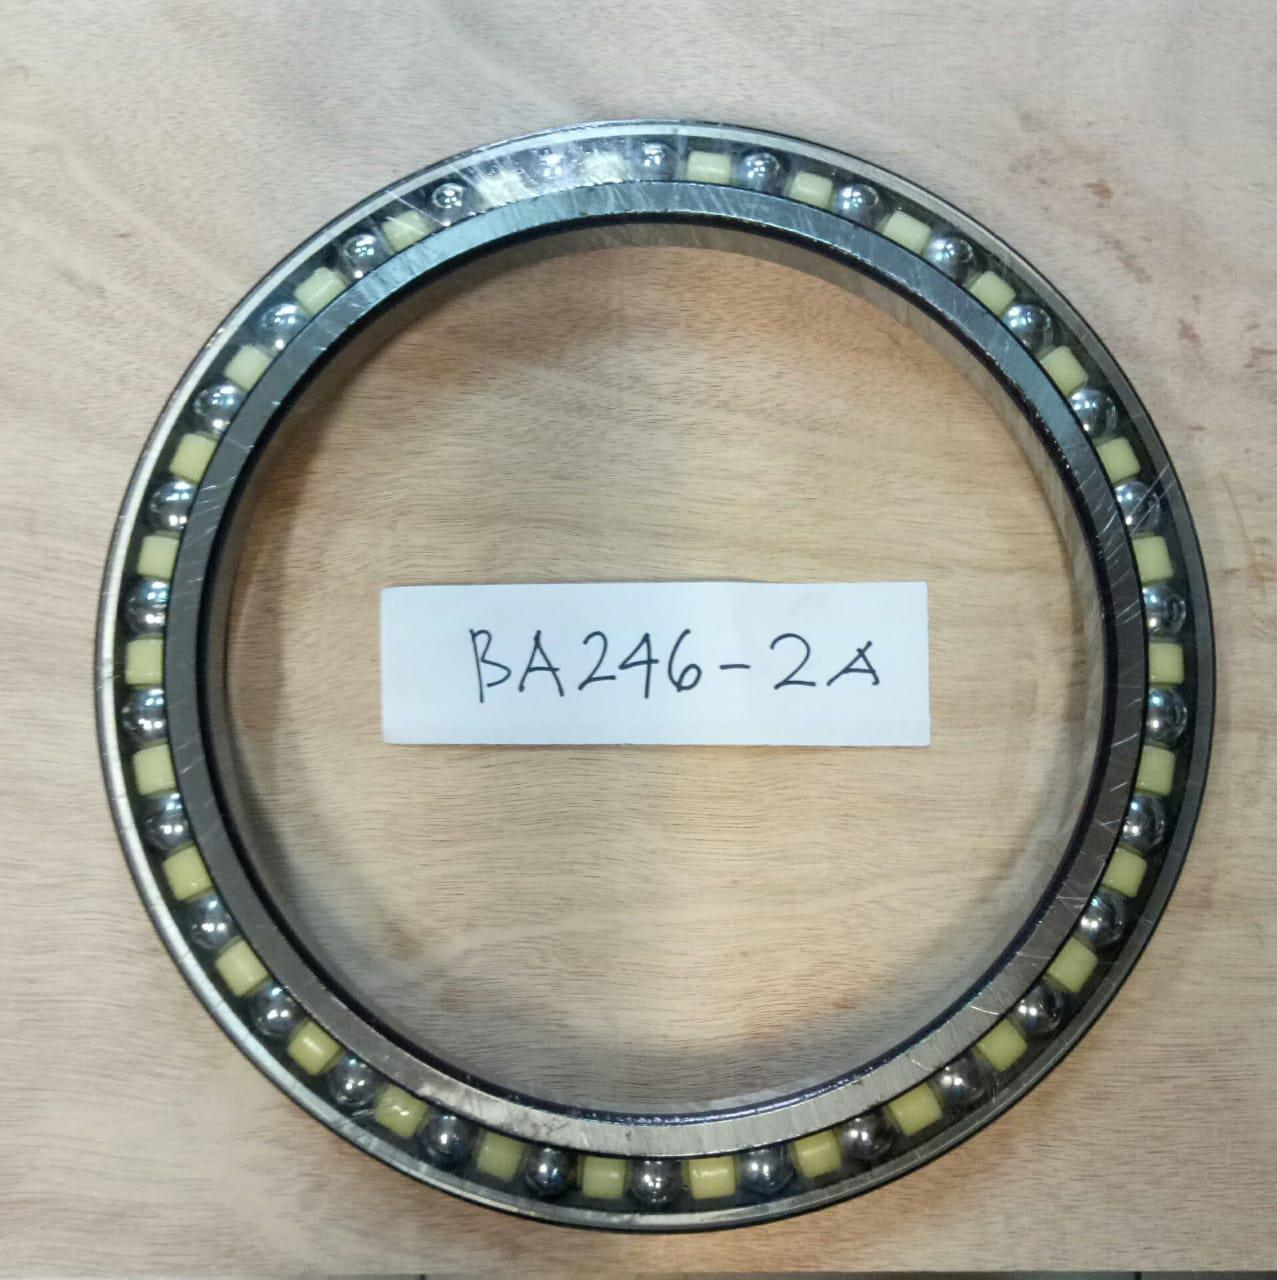 Bearing Excavator_BA246-2A